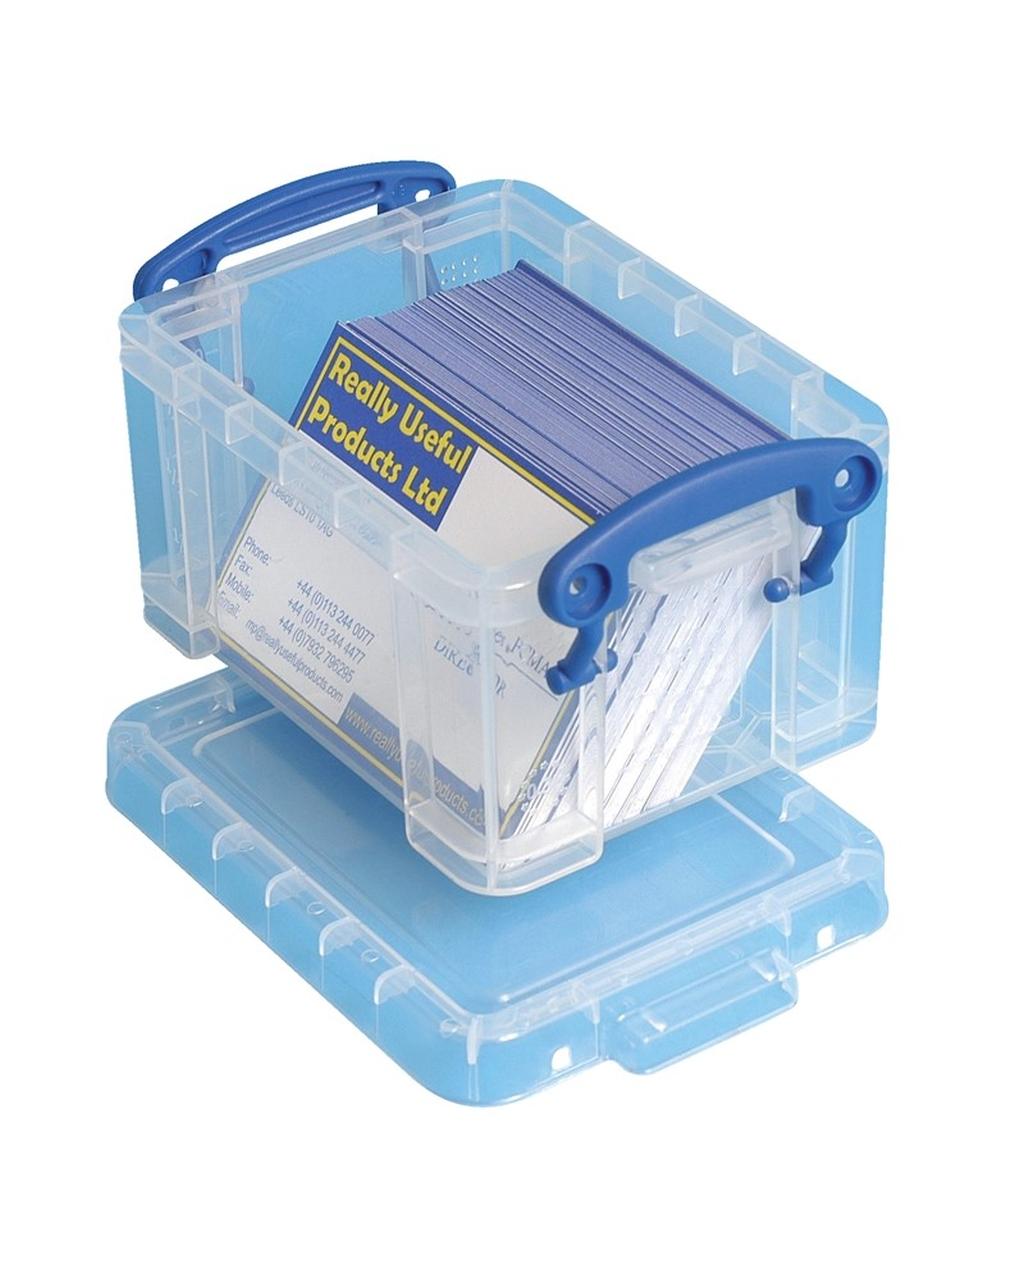 0.3 Litre Box